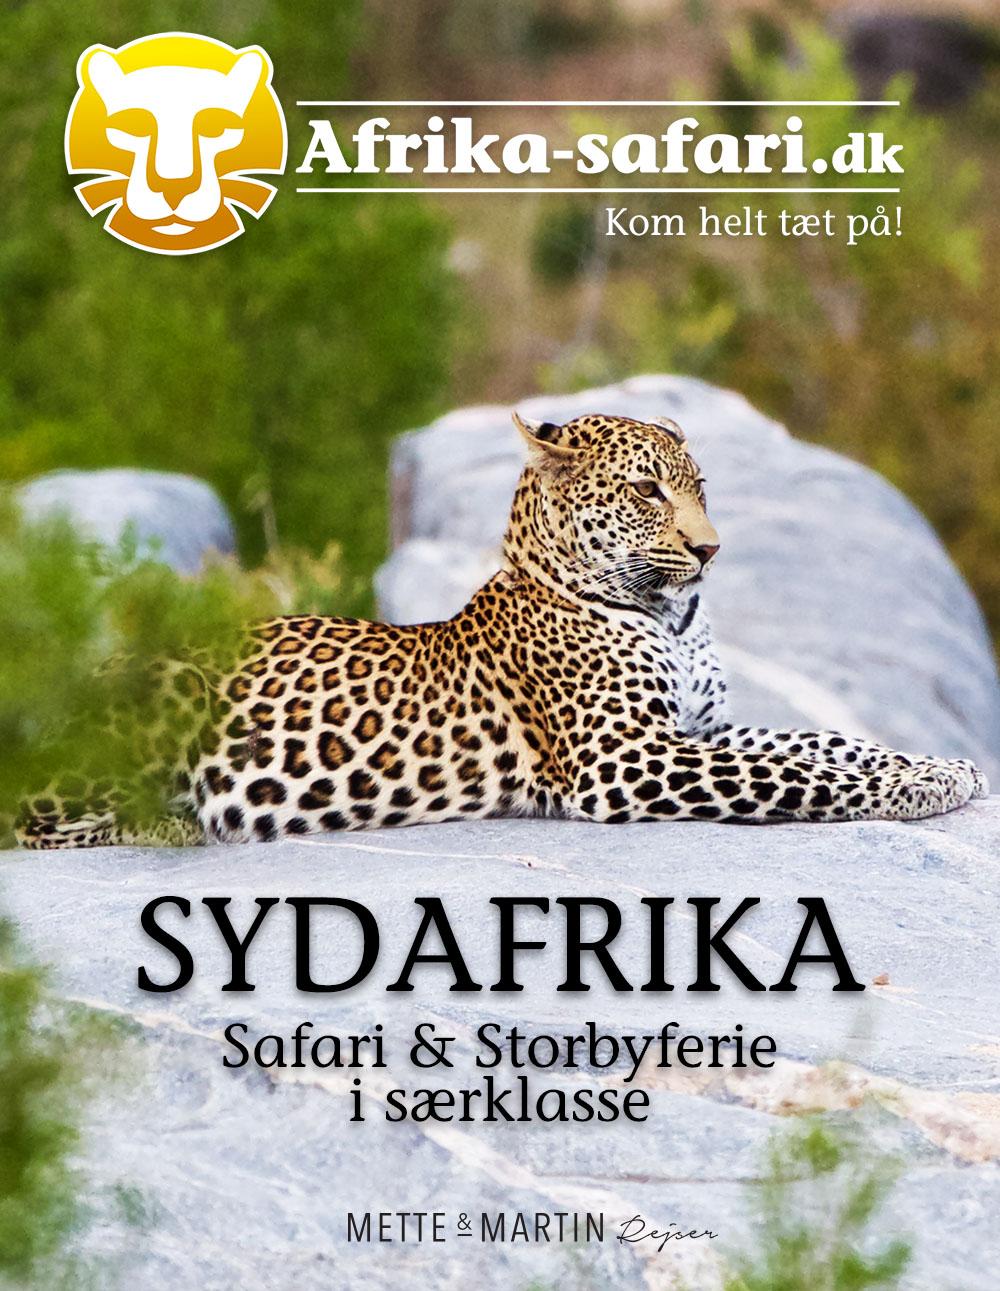 Rejseartikel om Sydafrika